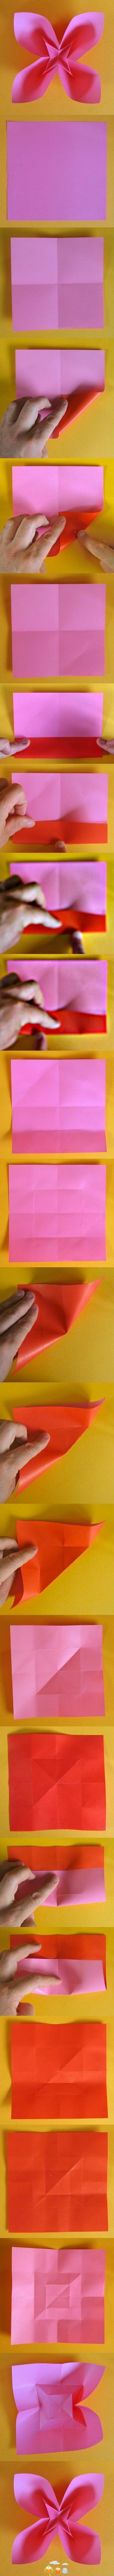 Origami Blüte